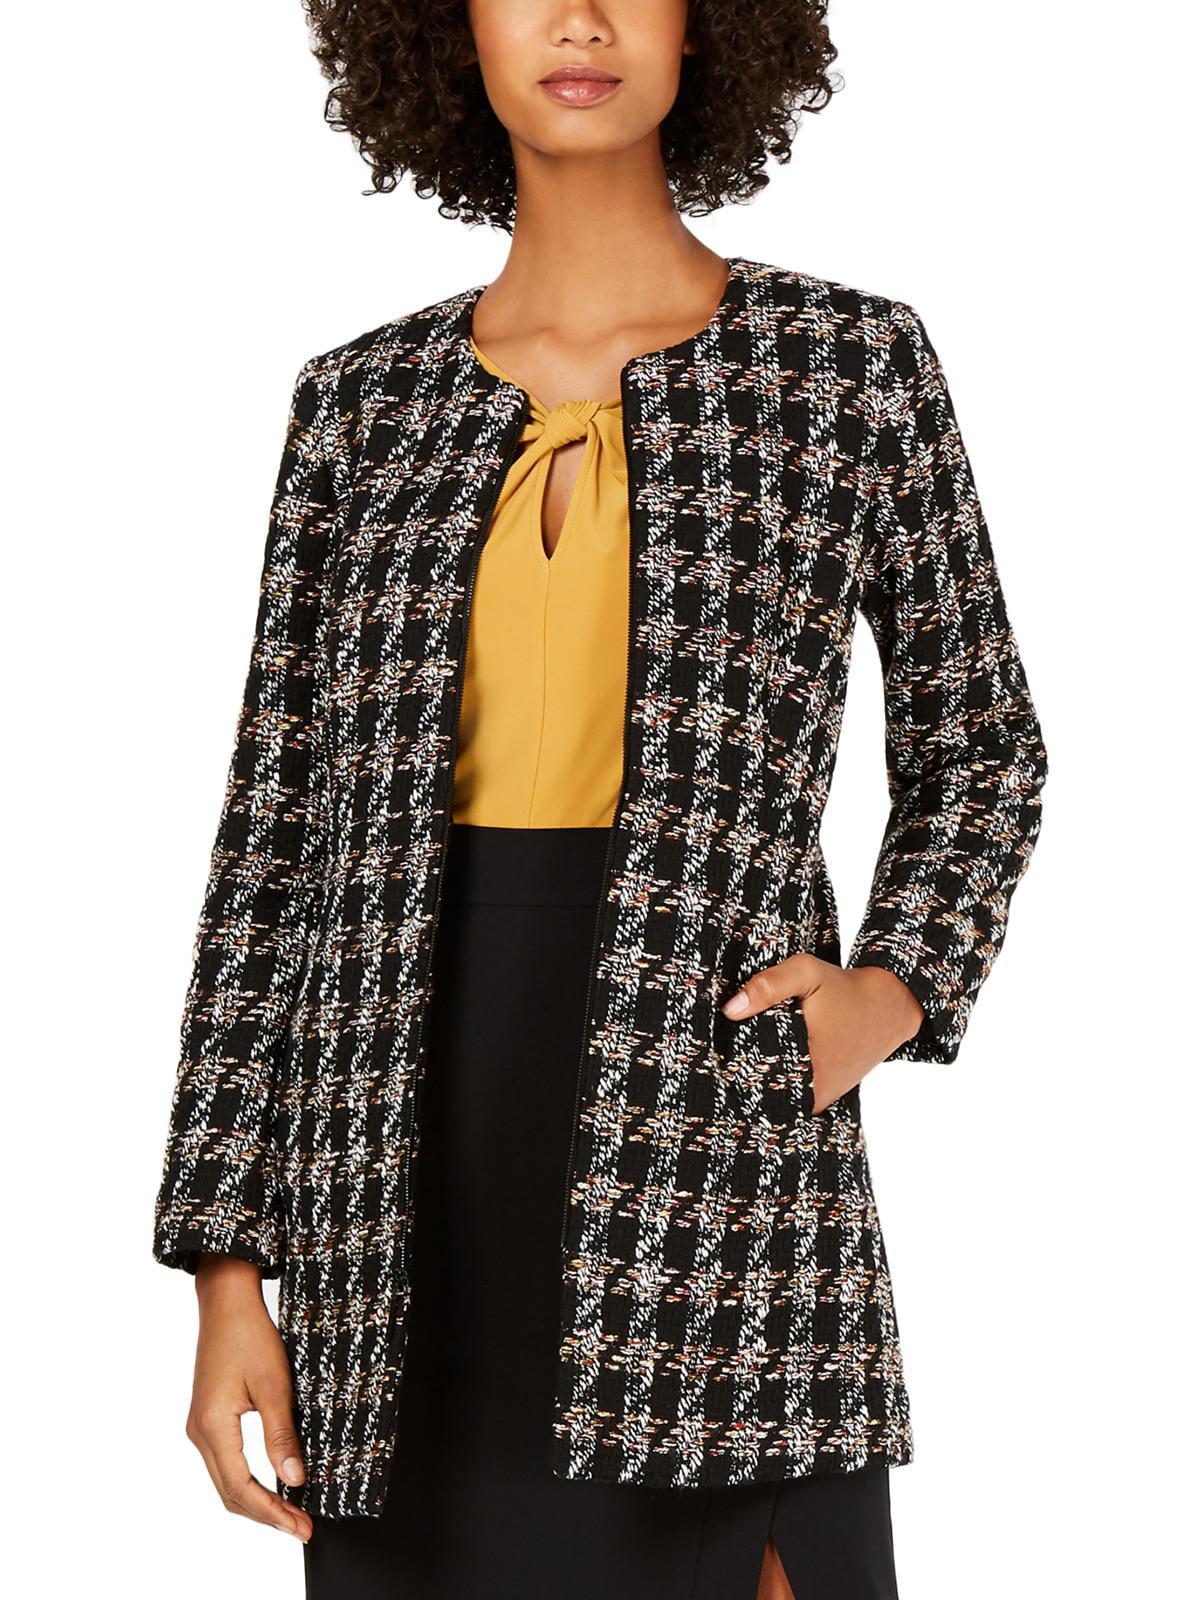 Nine West Women/'s Tweed Topper Jacket